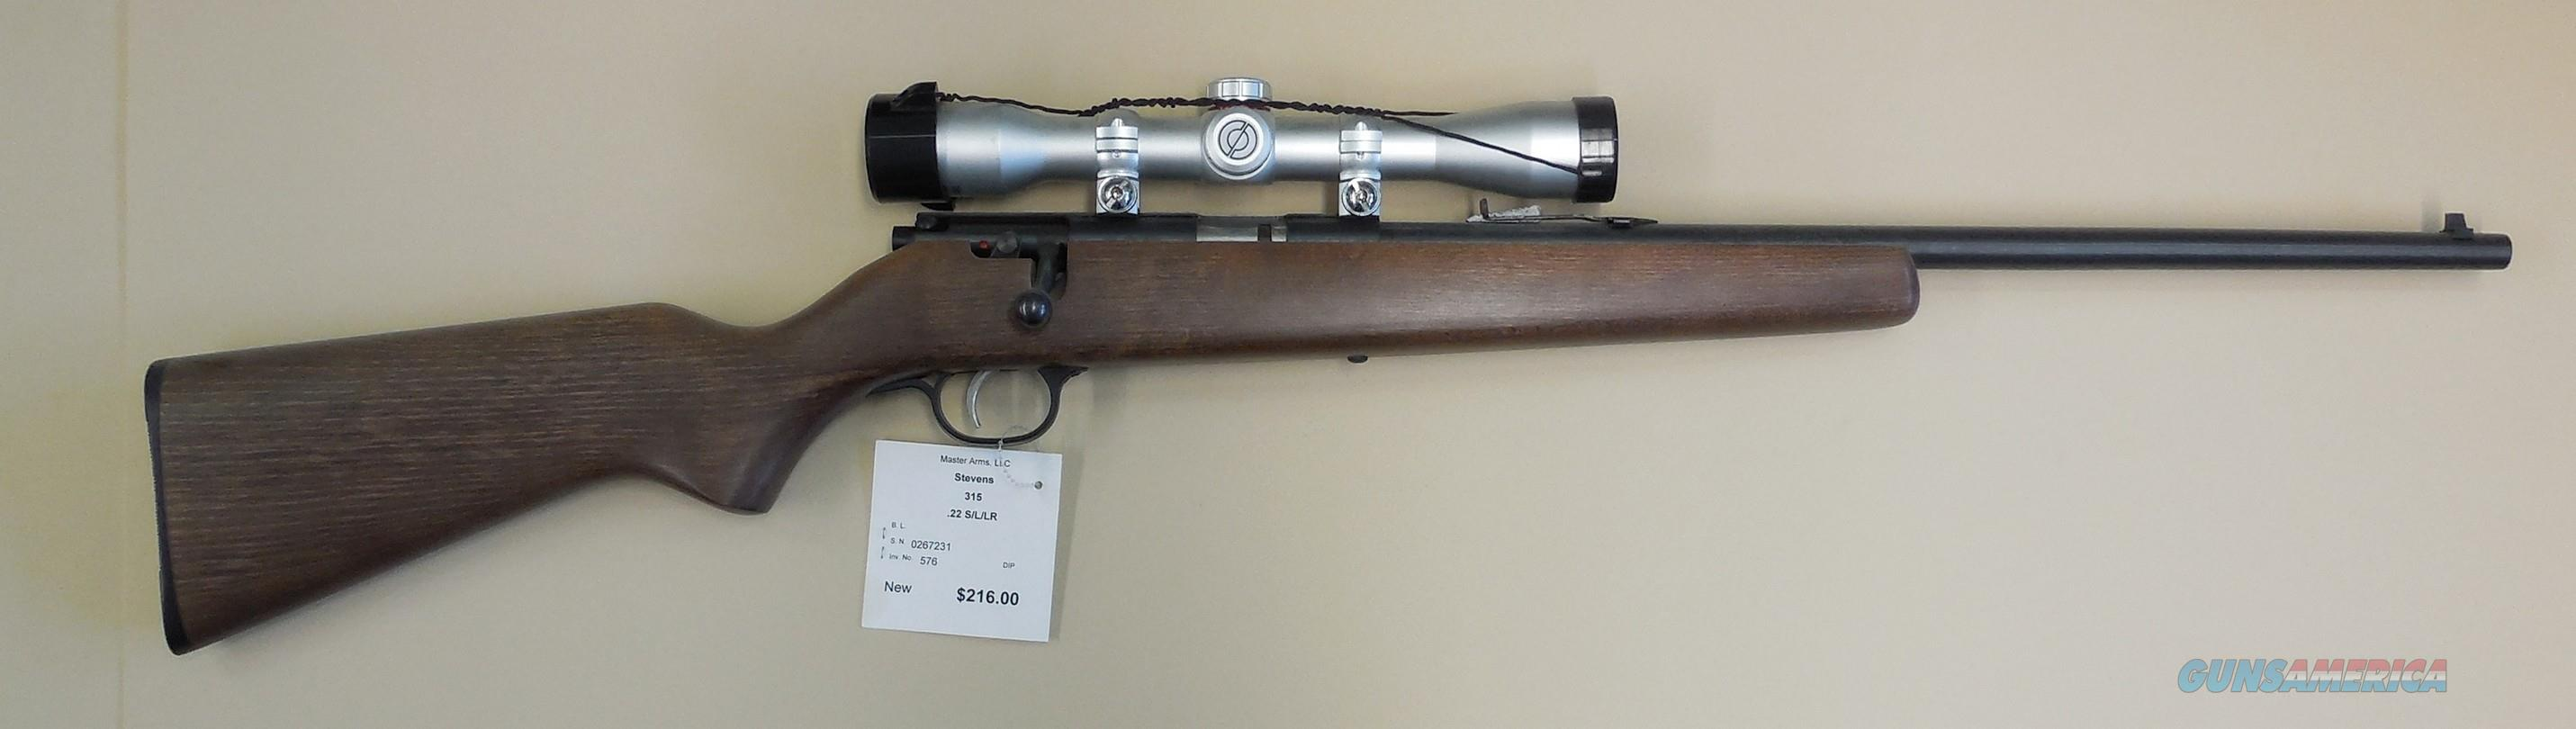 STEVENS 315 YOUTH   Guns > Rifles > Stevens Rifles